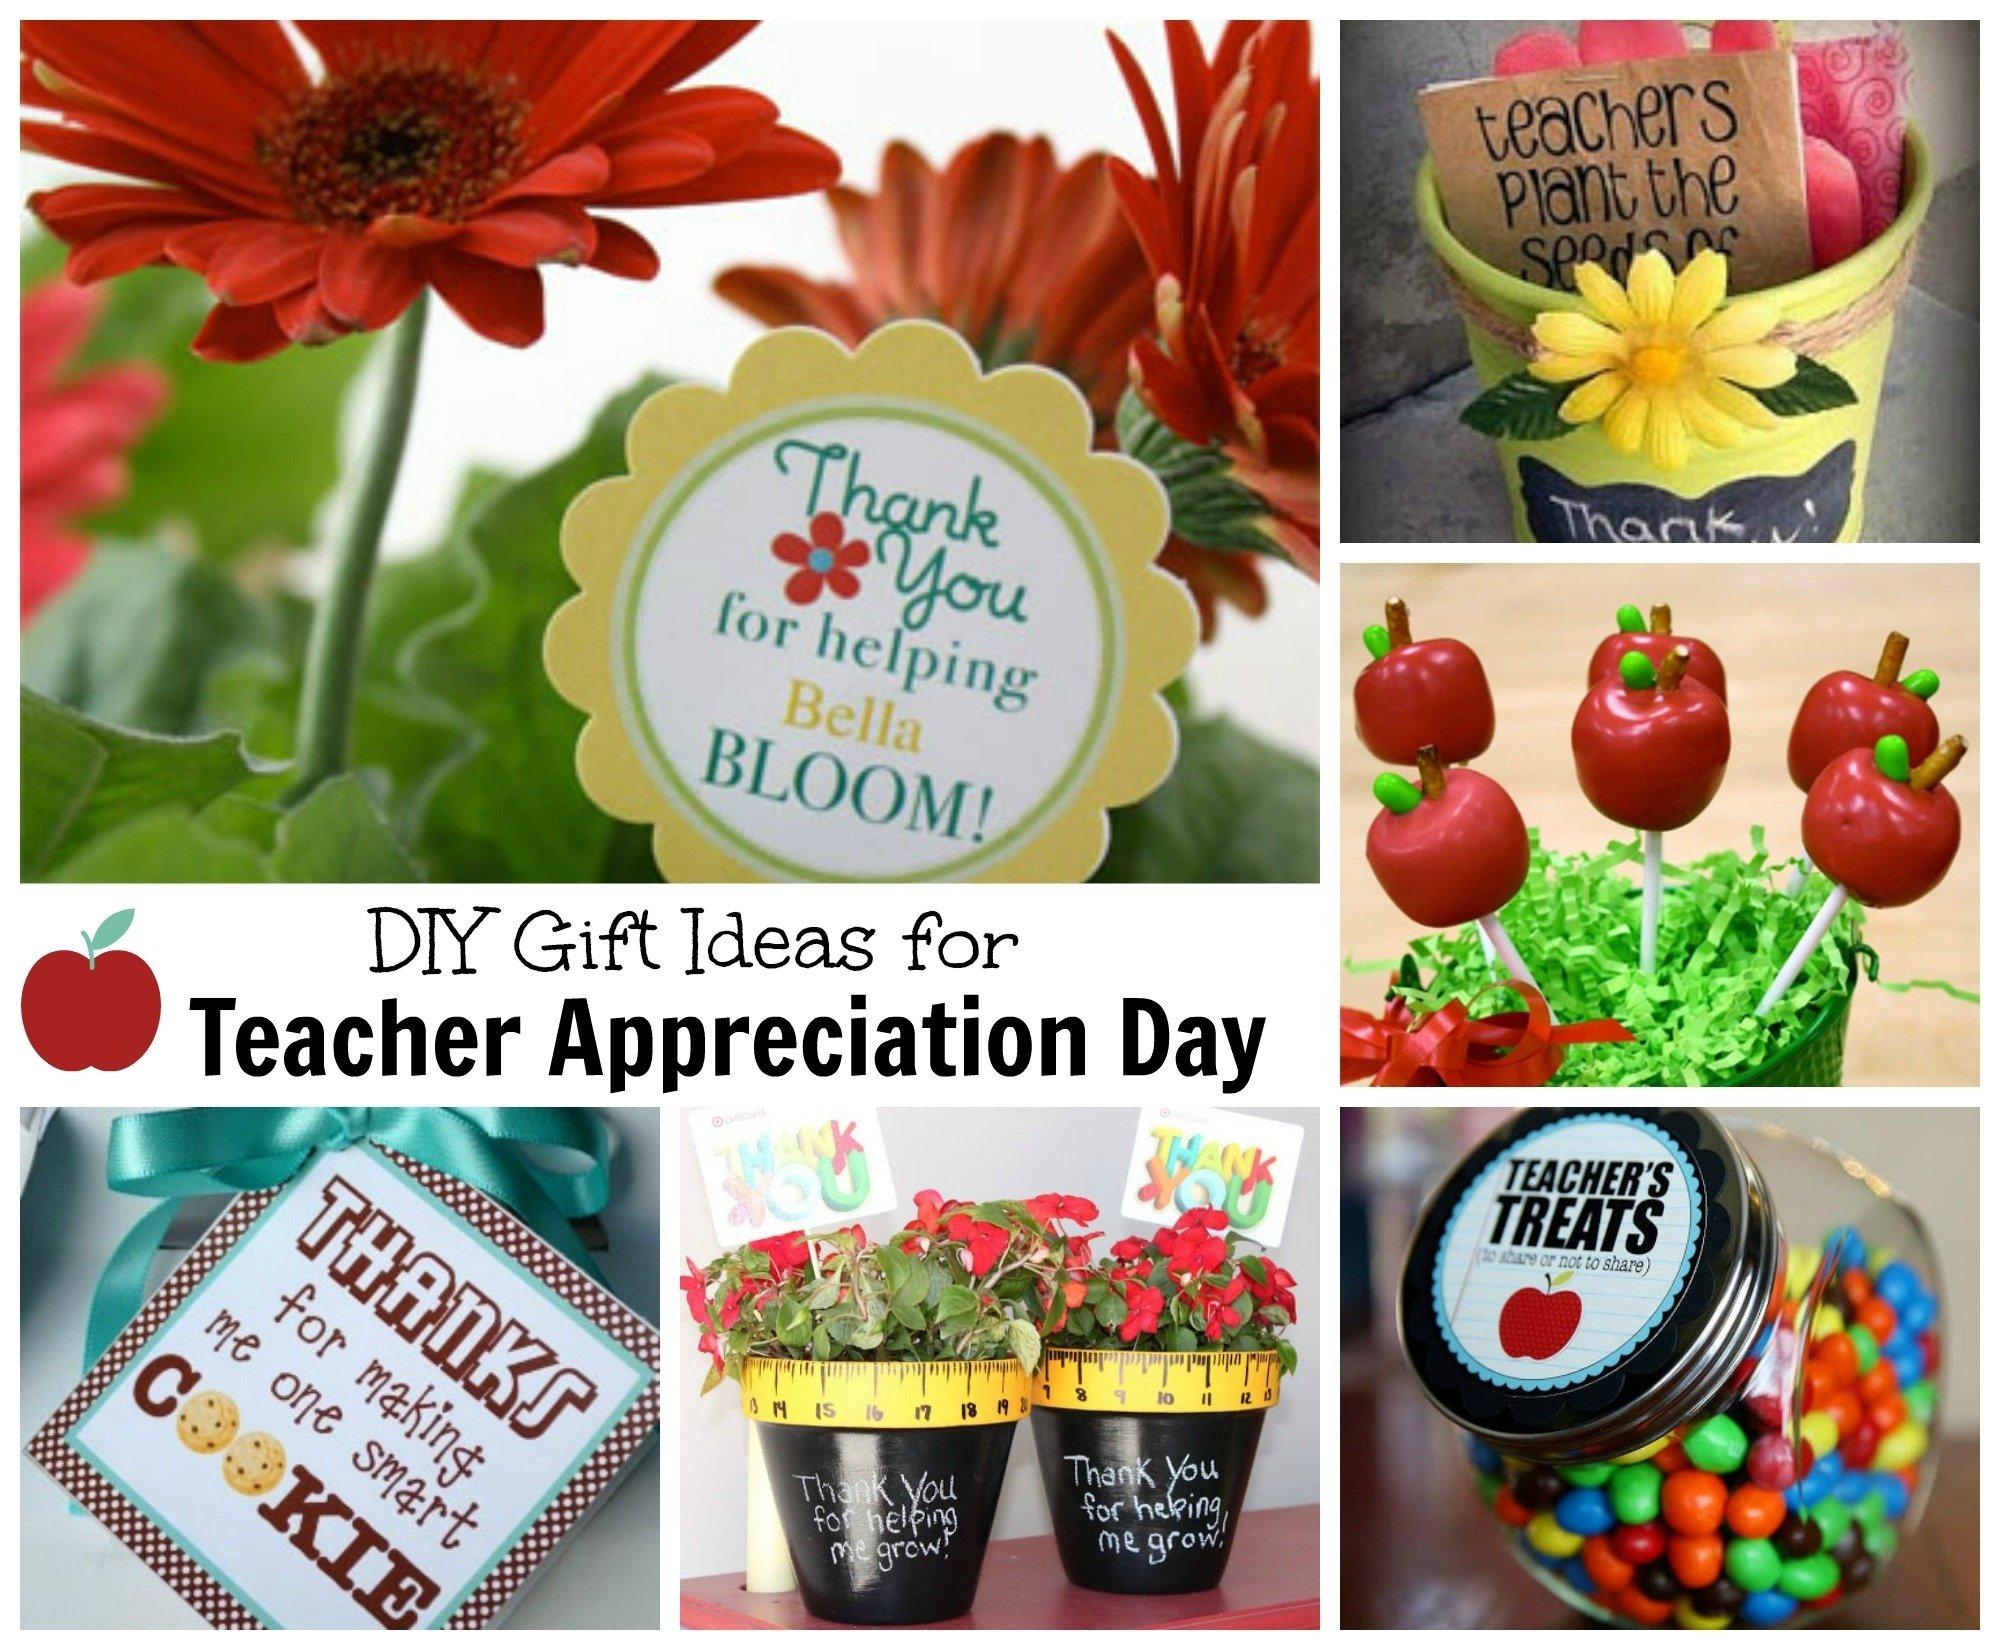 10 Cute Teachers Appreciation Week Gift Ideas 2021 With Teacher Appreciation Week 2021